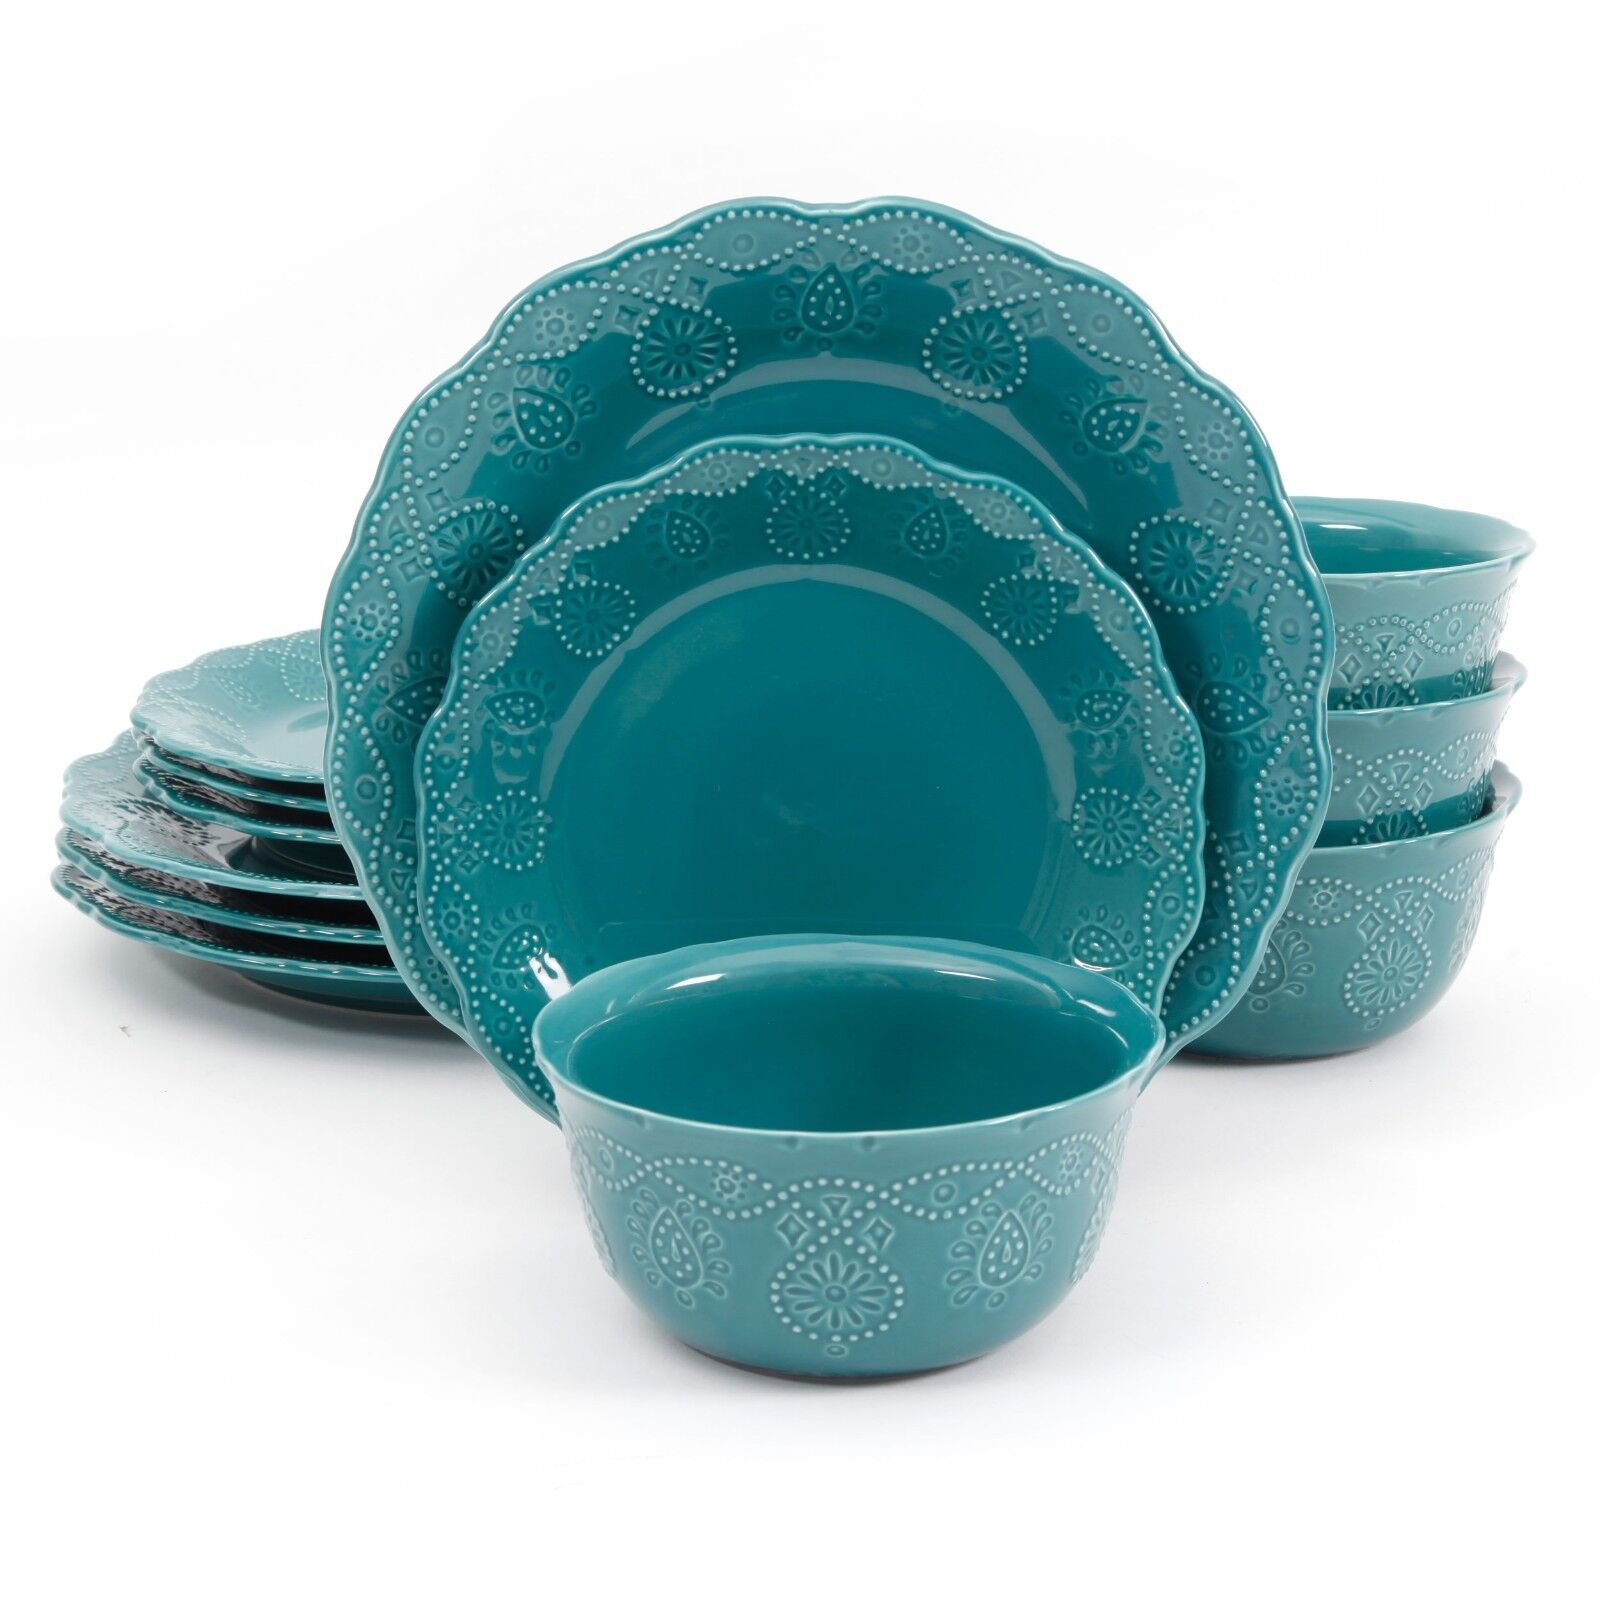 12 piece dinnerware set serving dishes service